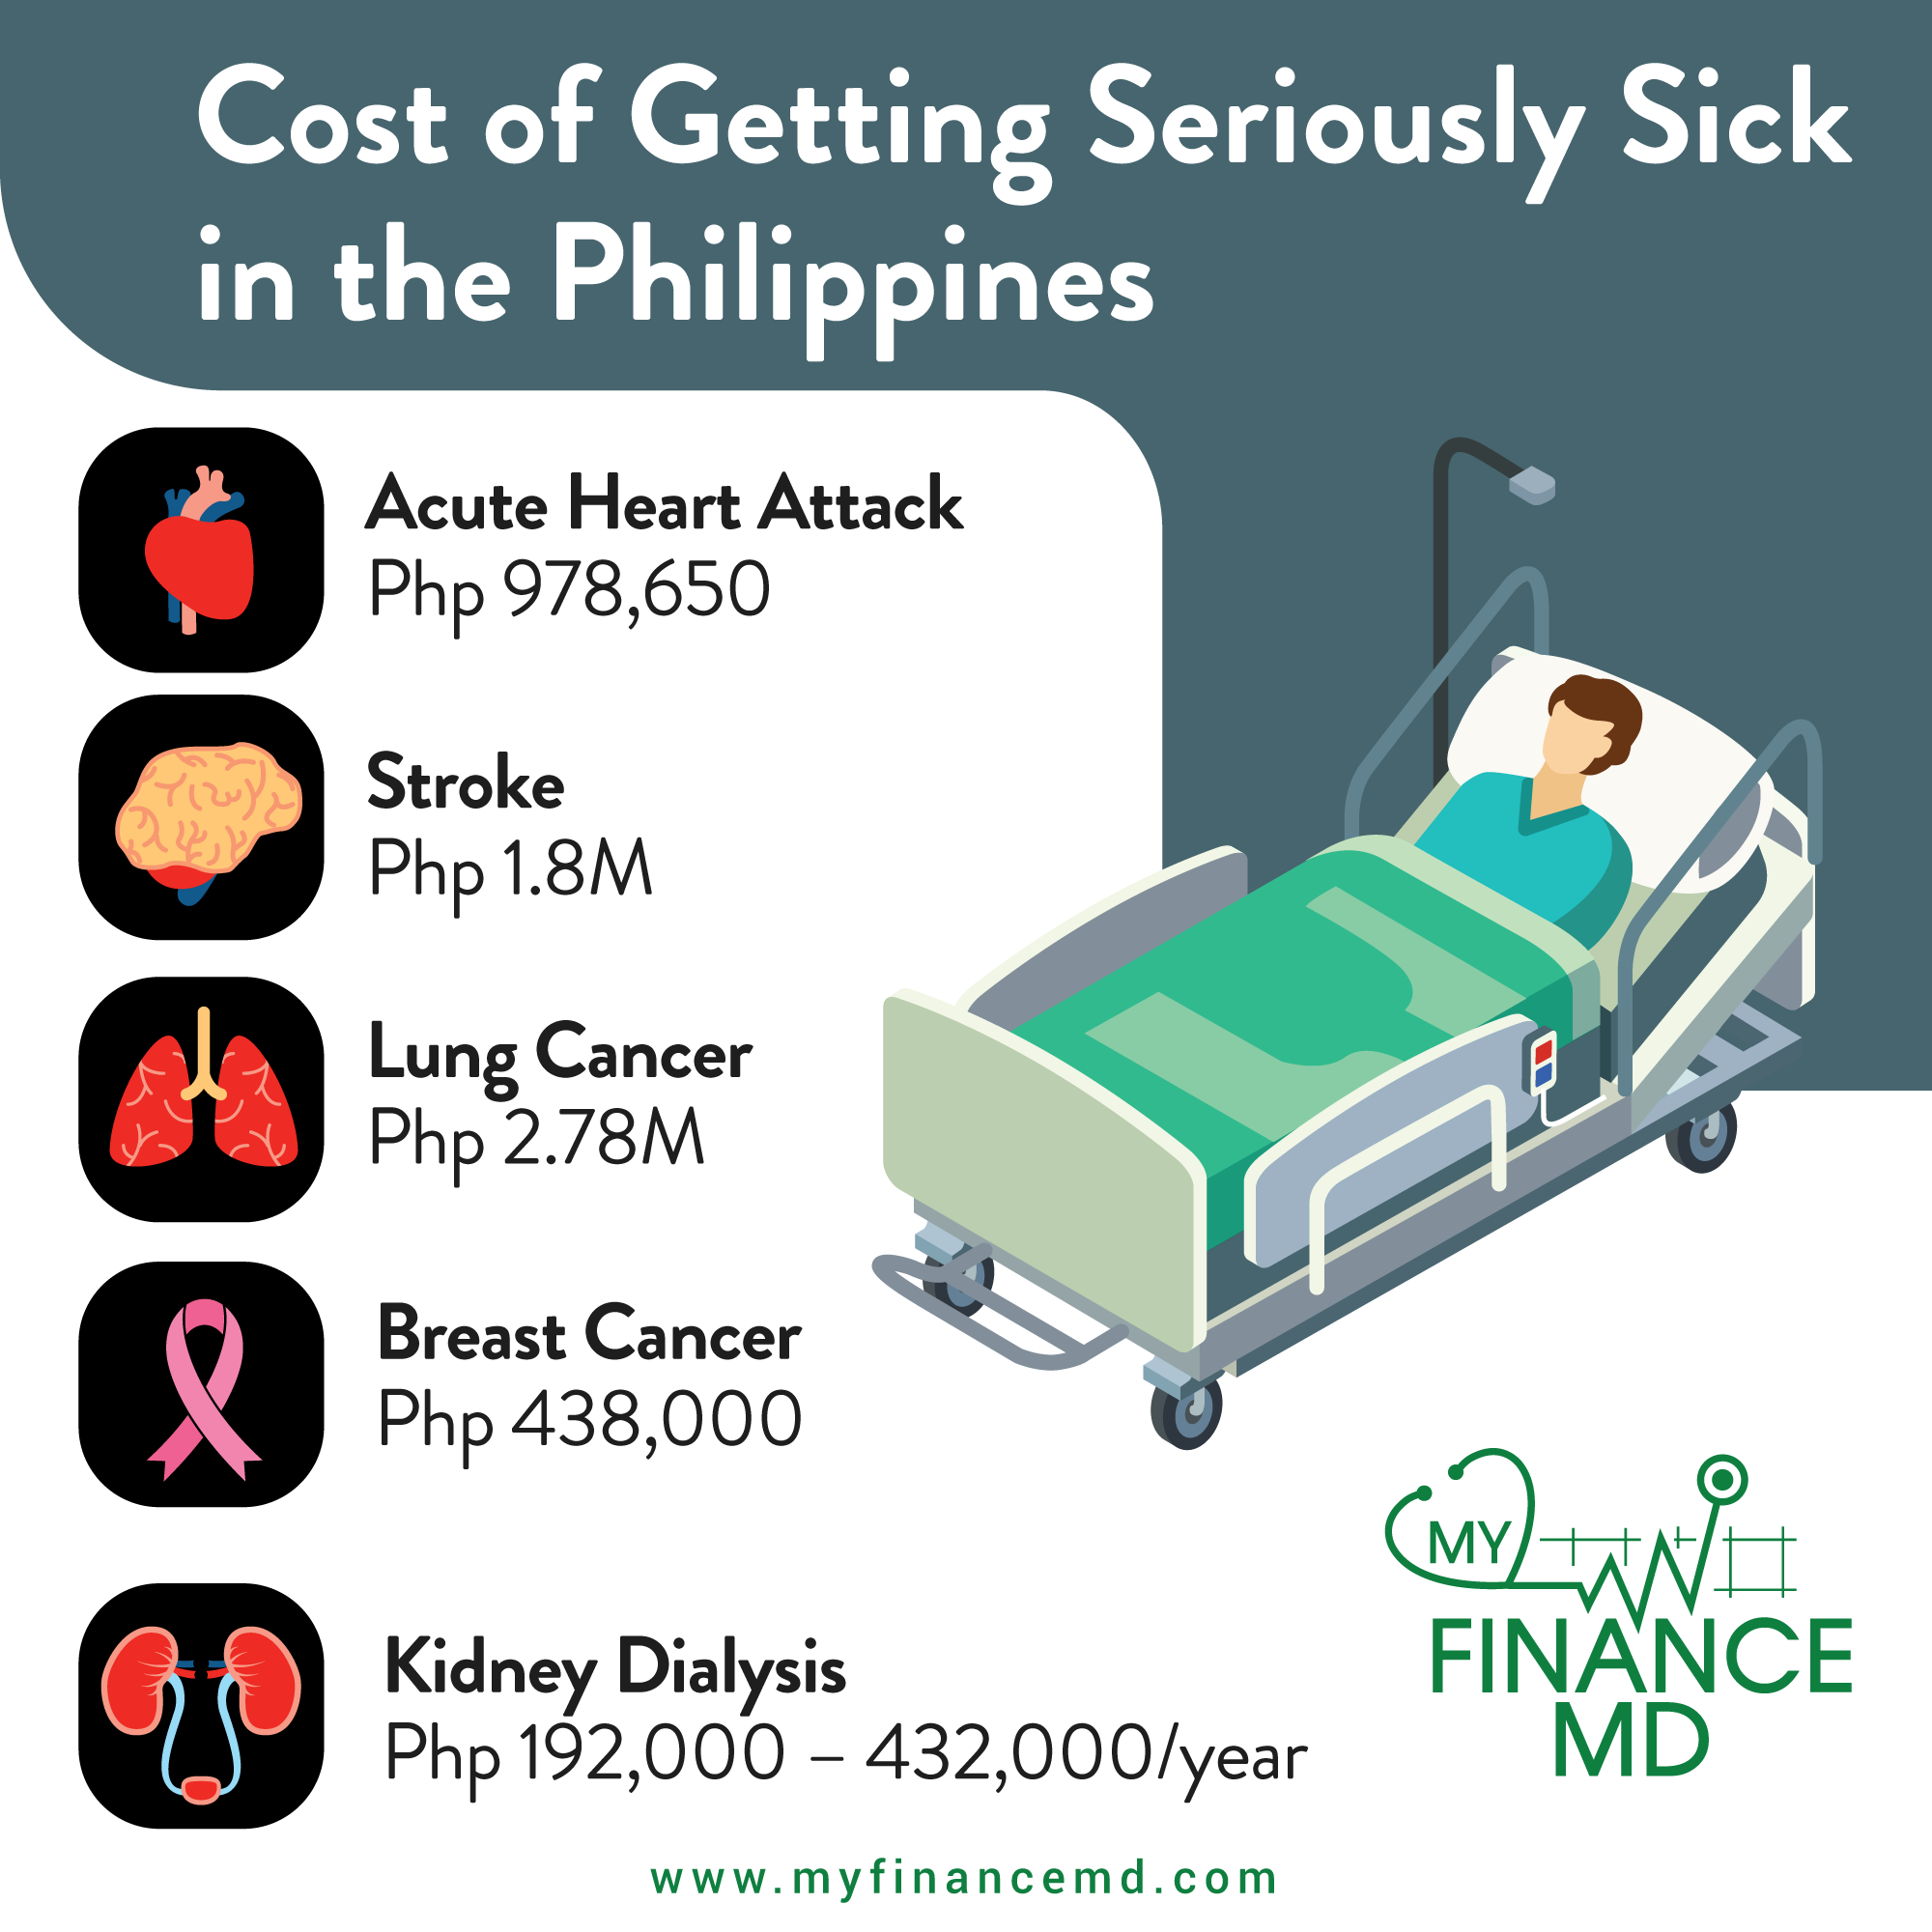 Cost-Sick-PH-infographic-myfinancemd - My Finance MD